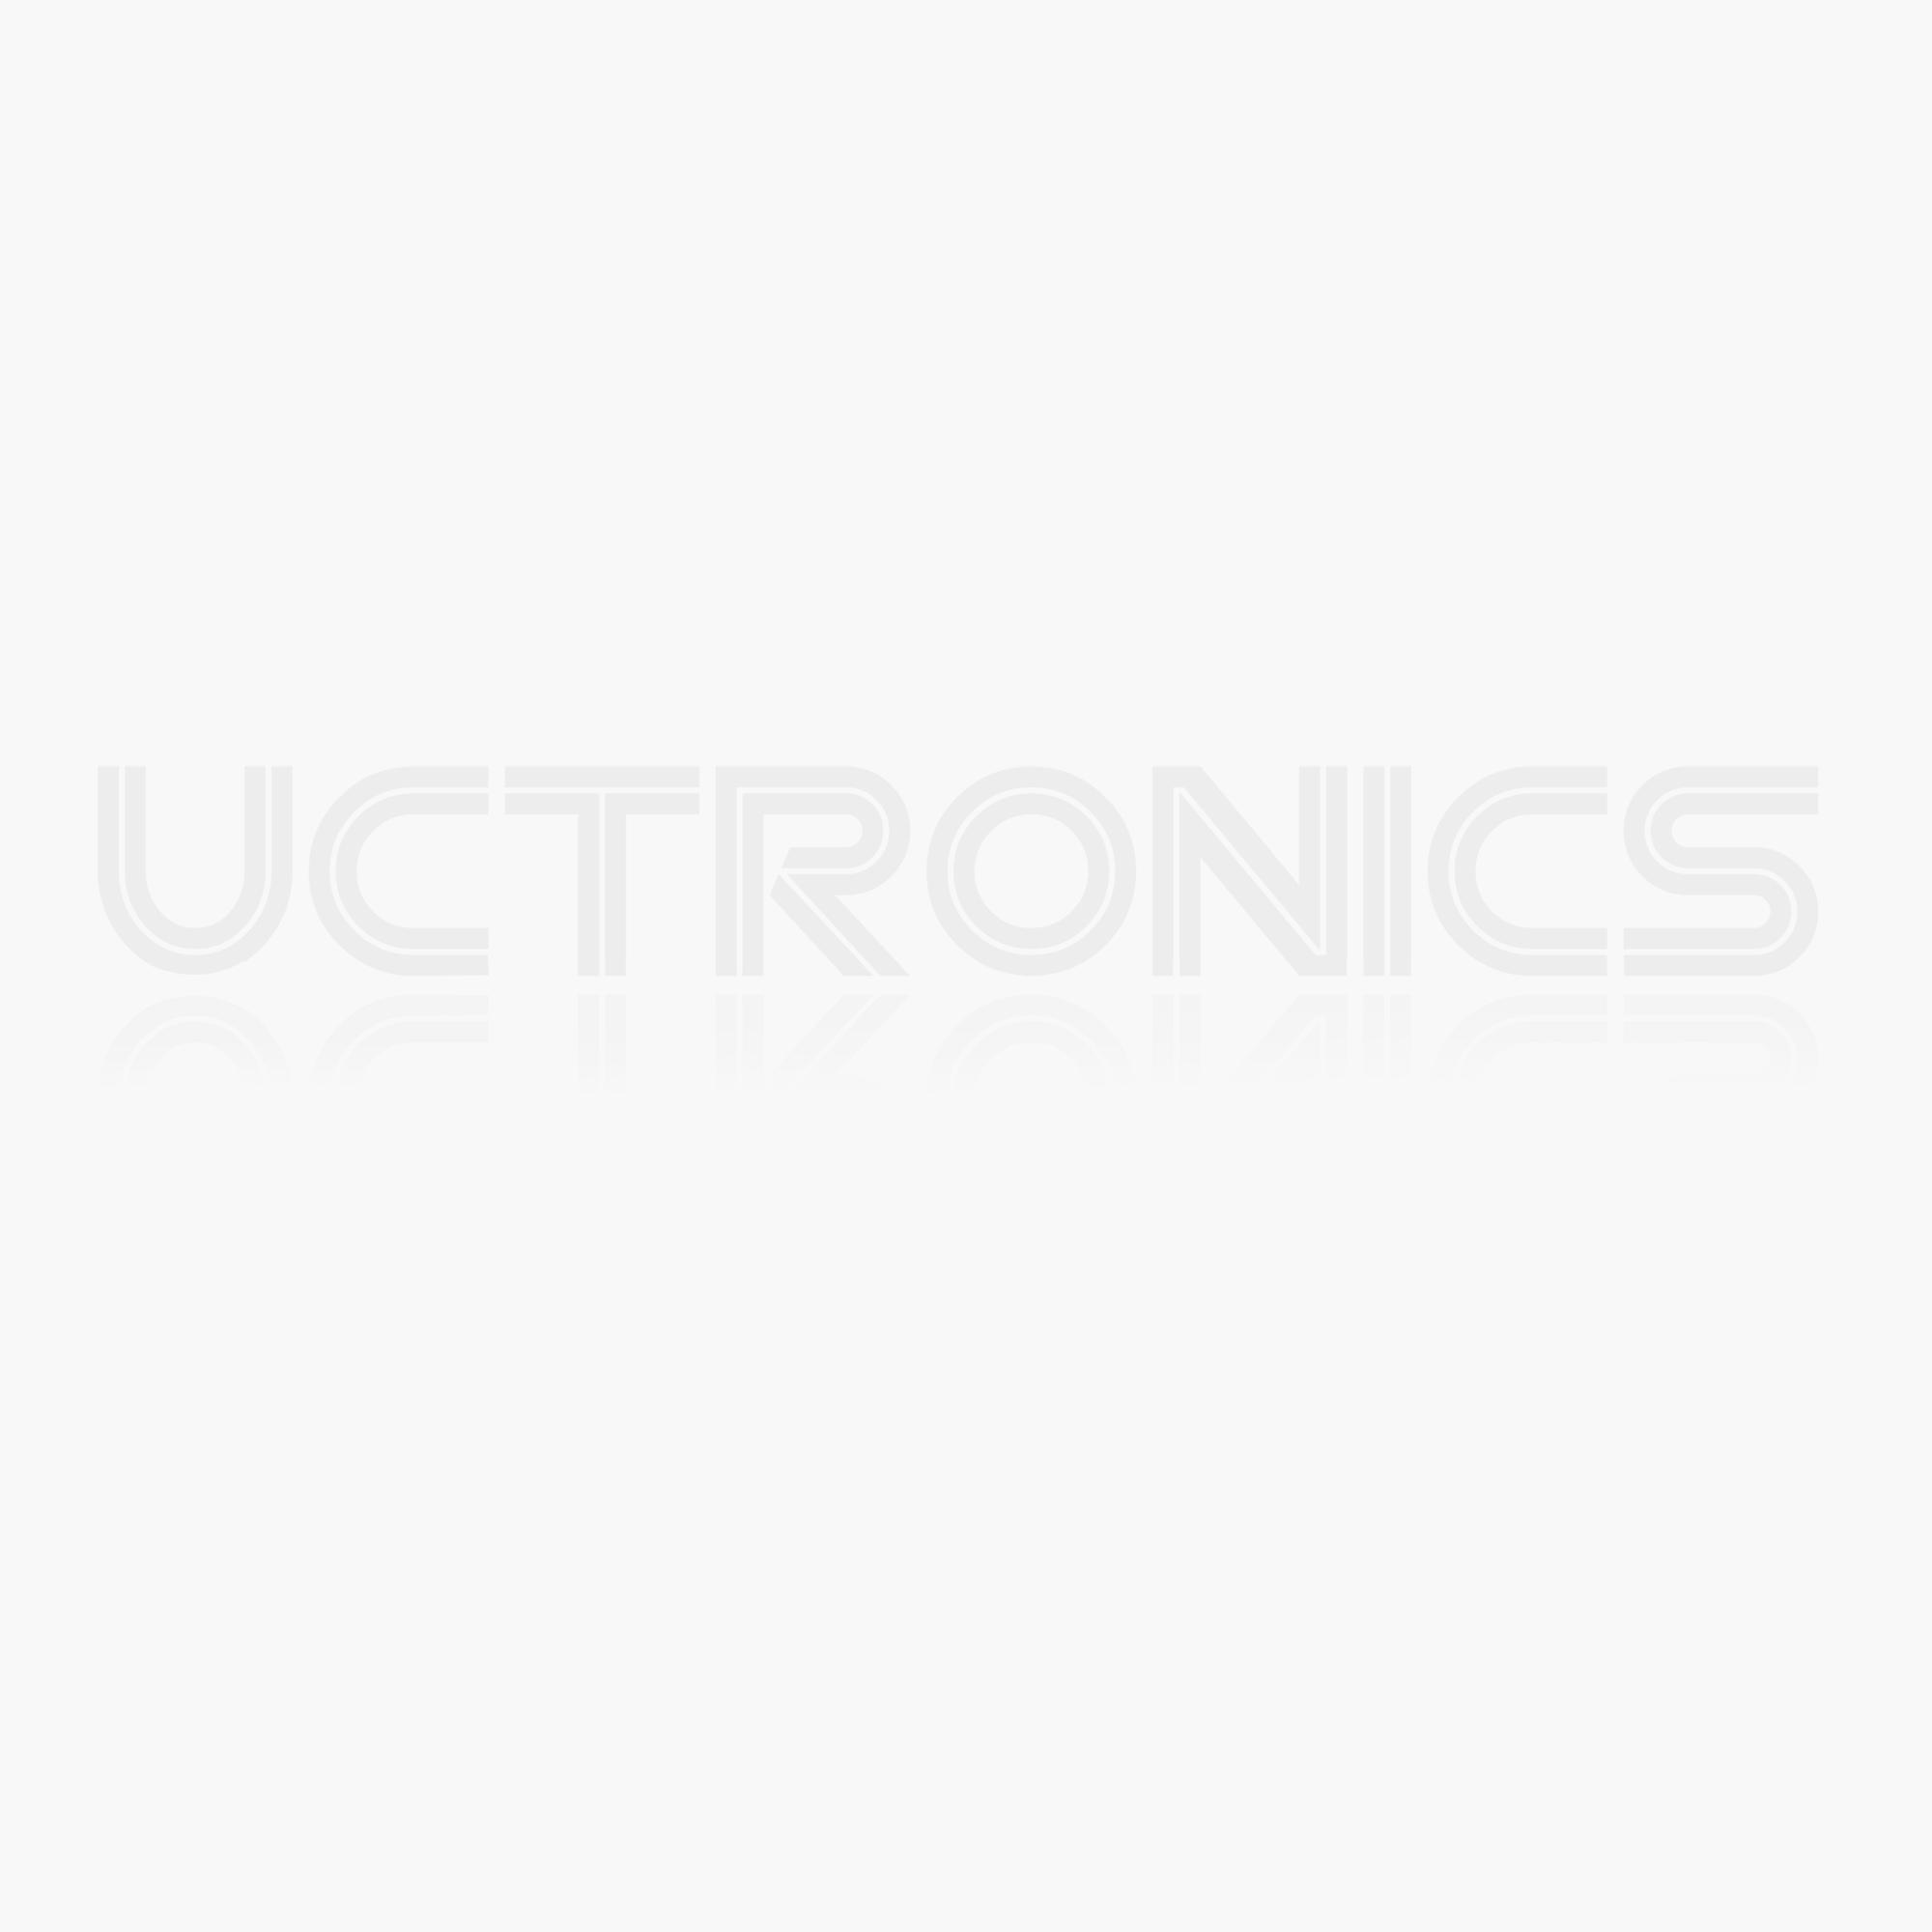 MG995 biped robot remote control car copper metal gearwheel servo